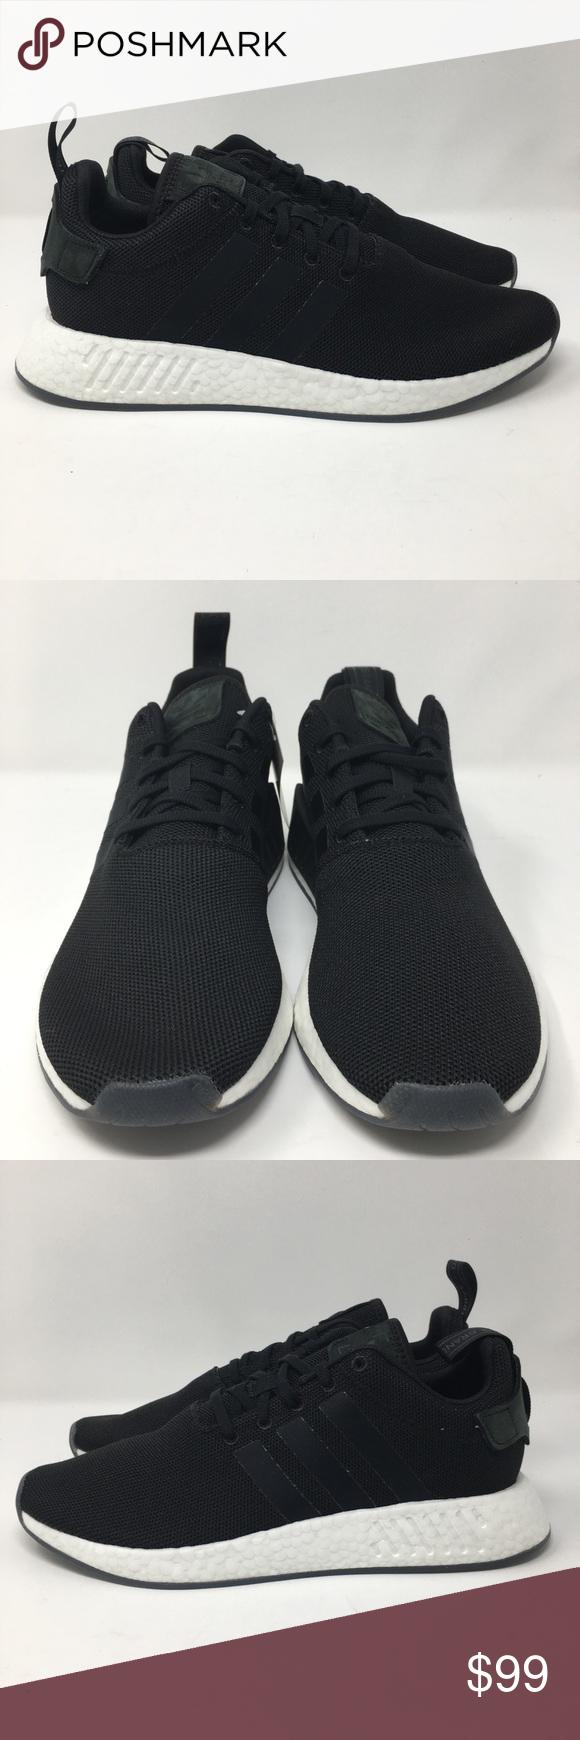 wholesale dealer 85d55 0dedf F1925) Adidas NMD R2 CQ2402 Black Men 10 Adidas NMD R2 Mens ...